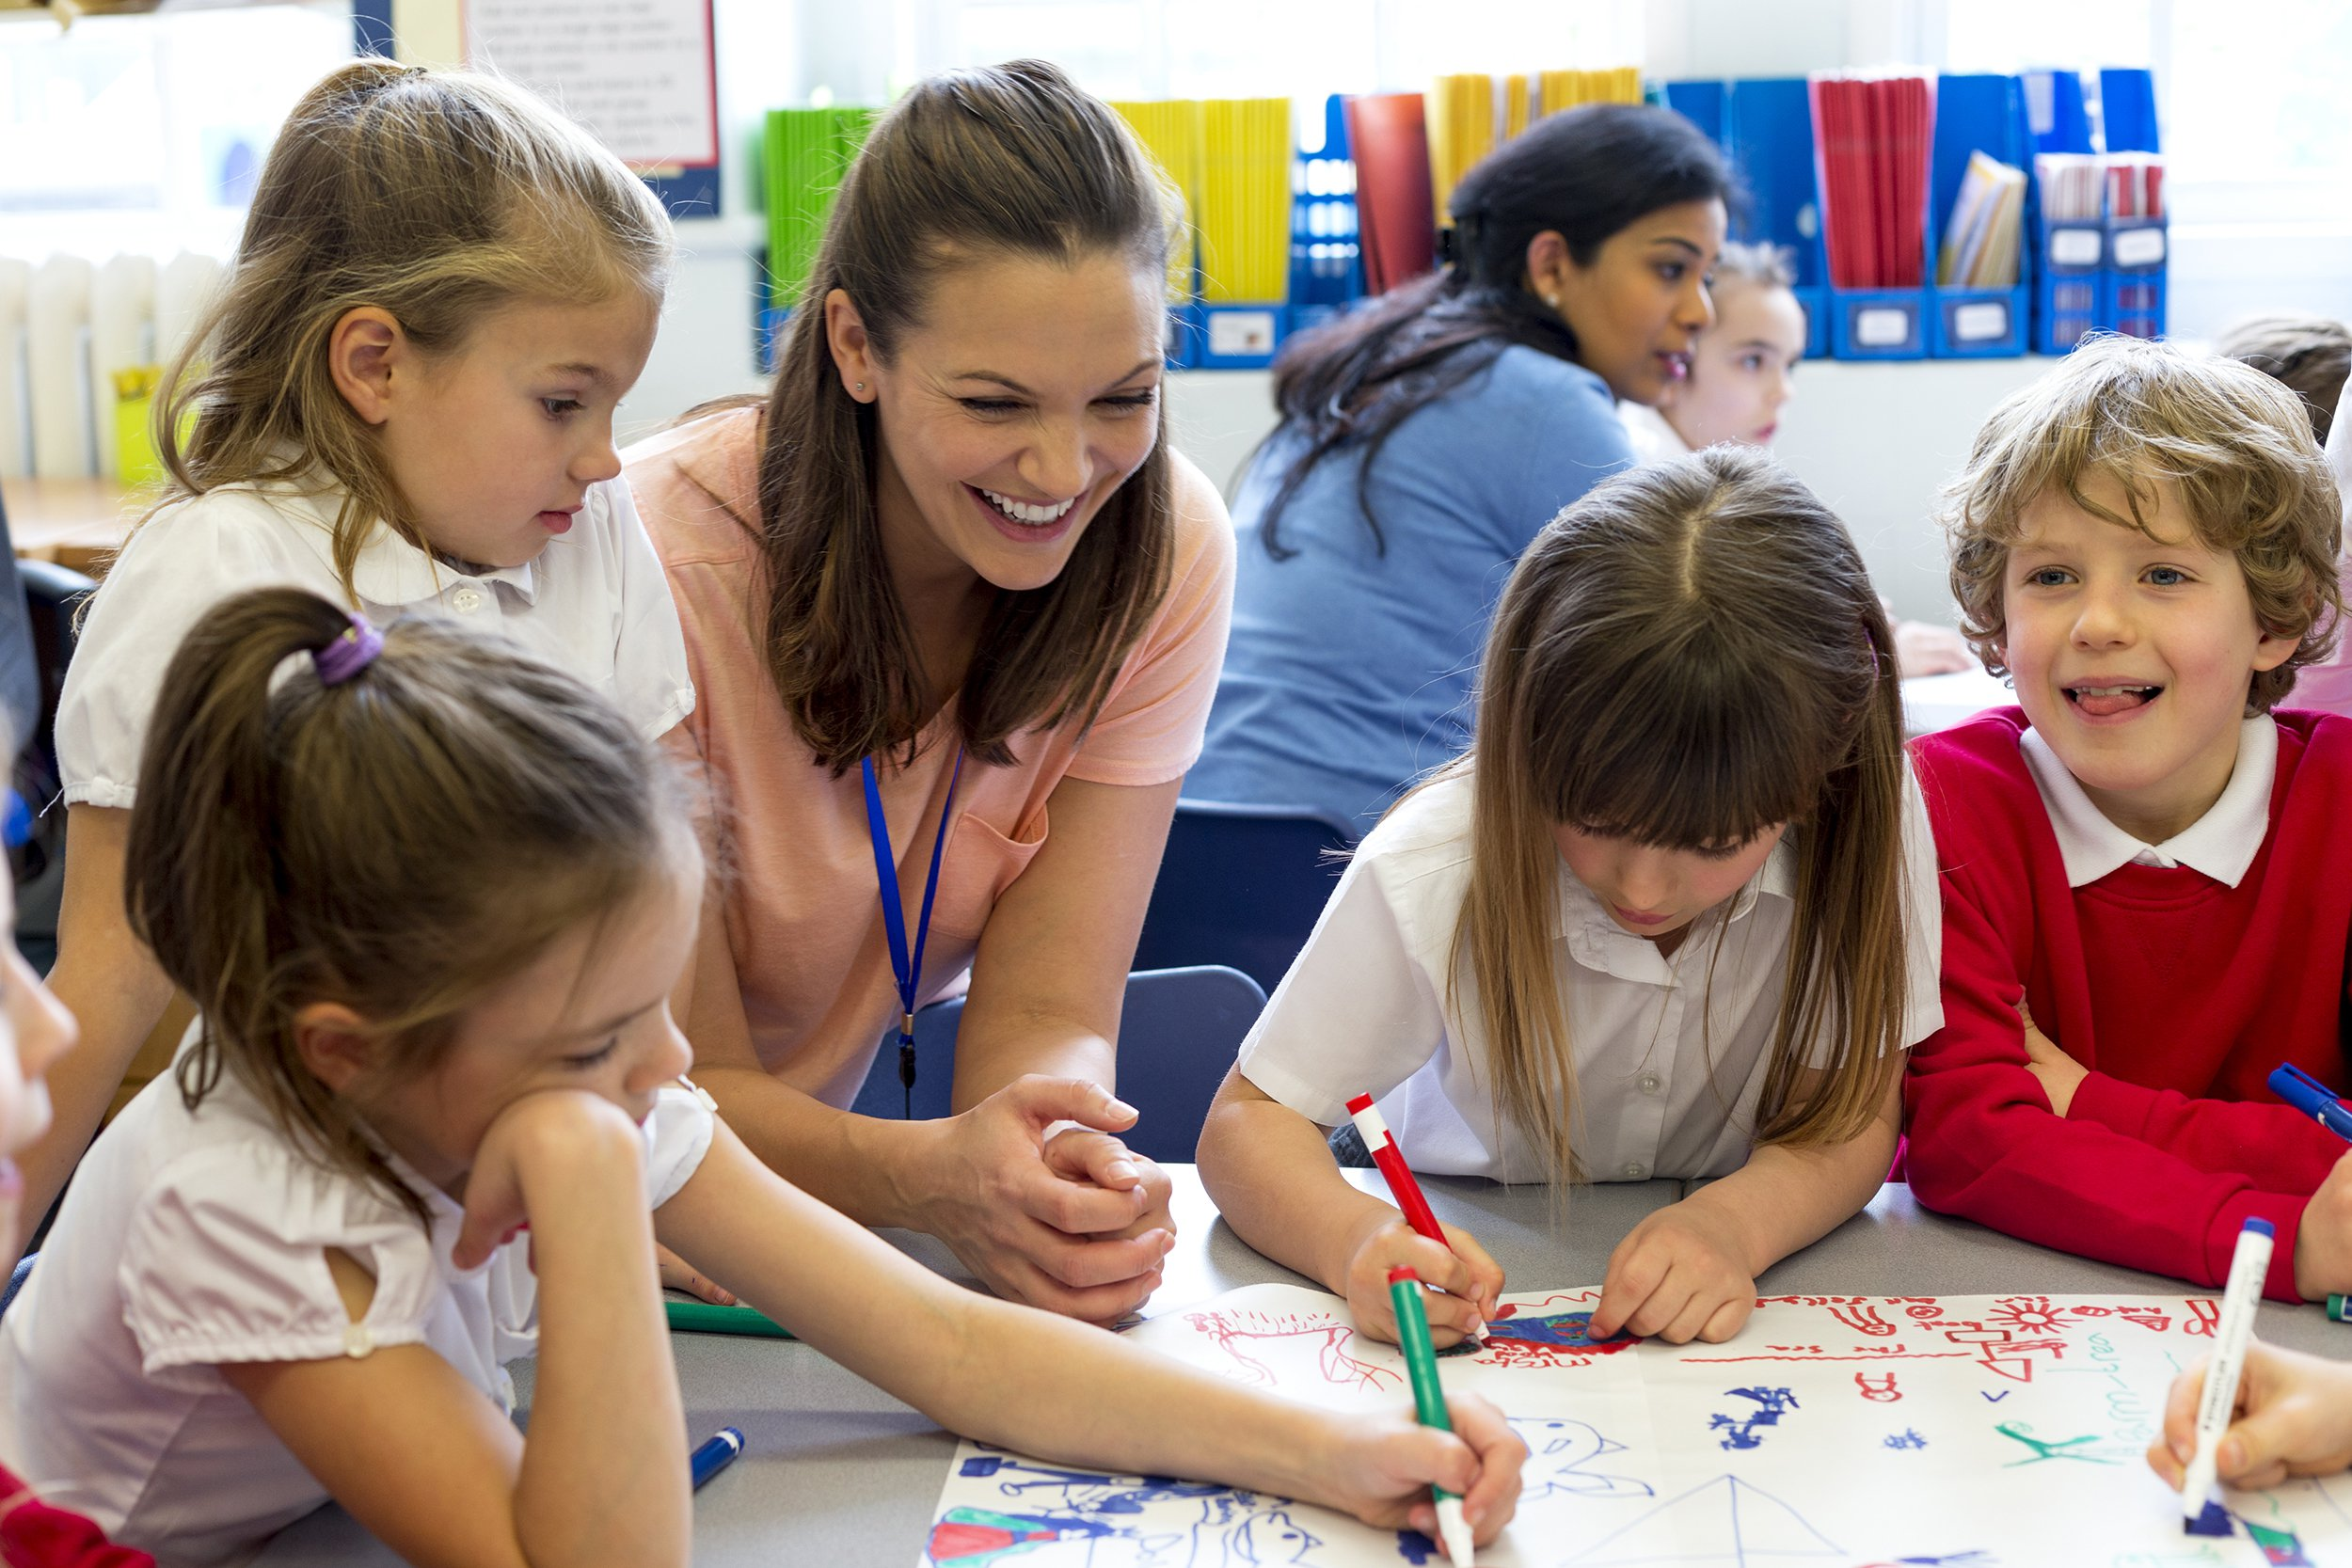 050418_teachers_pay_around_the_world_slide_20_f.original.jpg